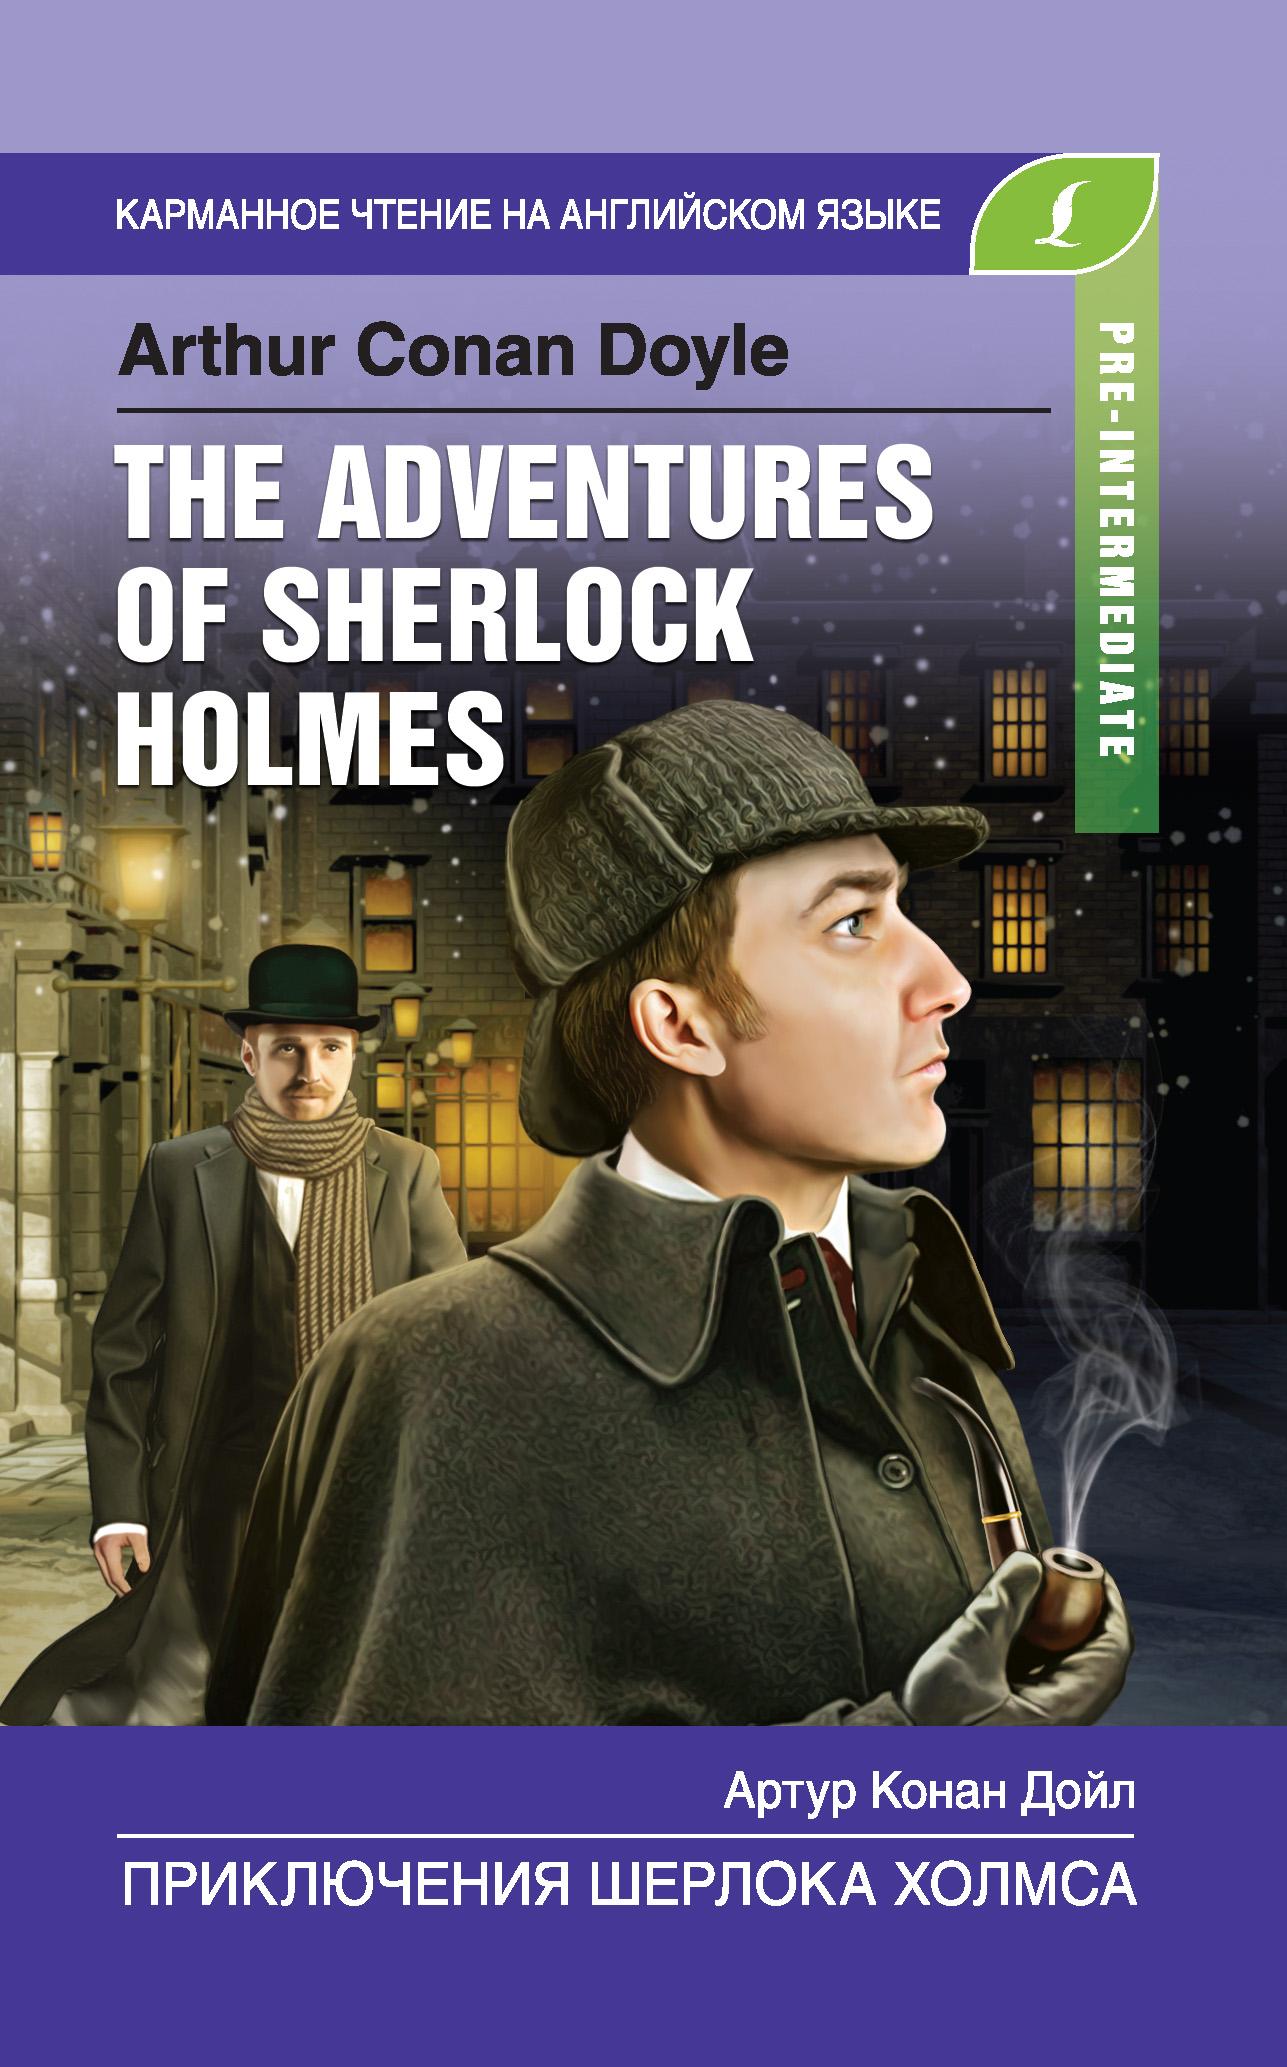 Артур Конан Дойл Приключения Шерлока Холмса / The Adventures of Sherlock Holmes артур конан дойл приключения шерлока холмса the adventures of sherlock holmes сборник